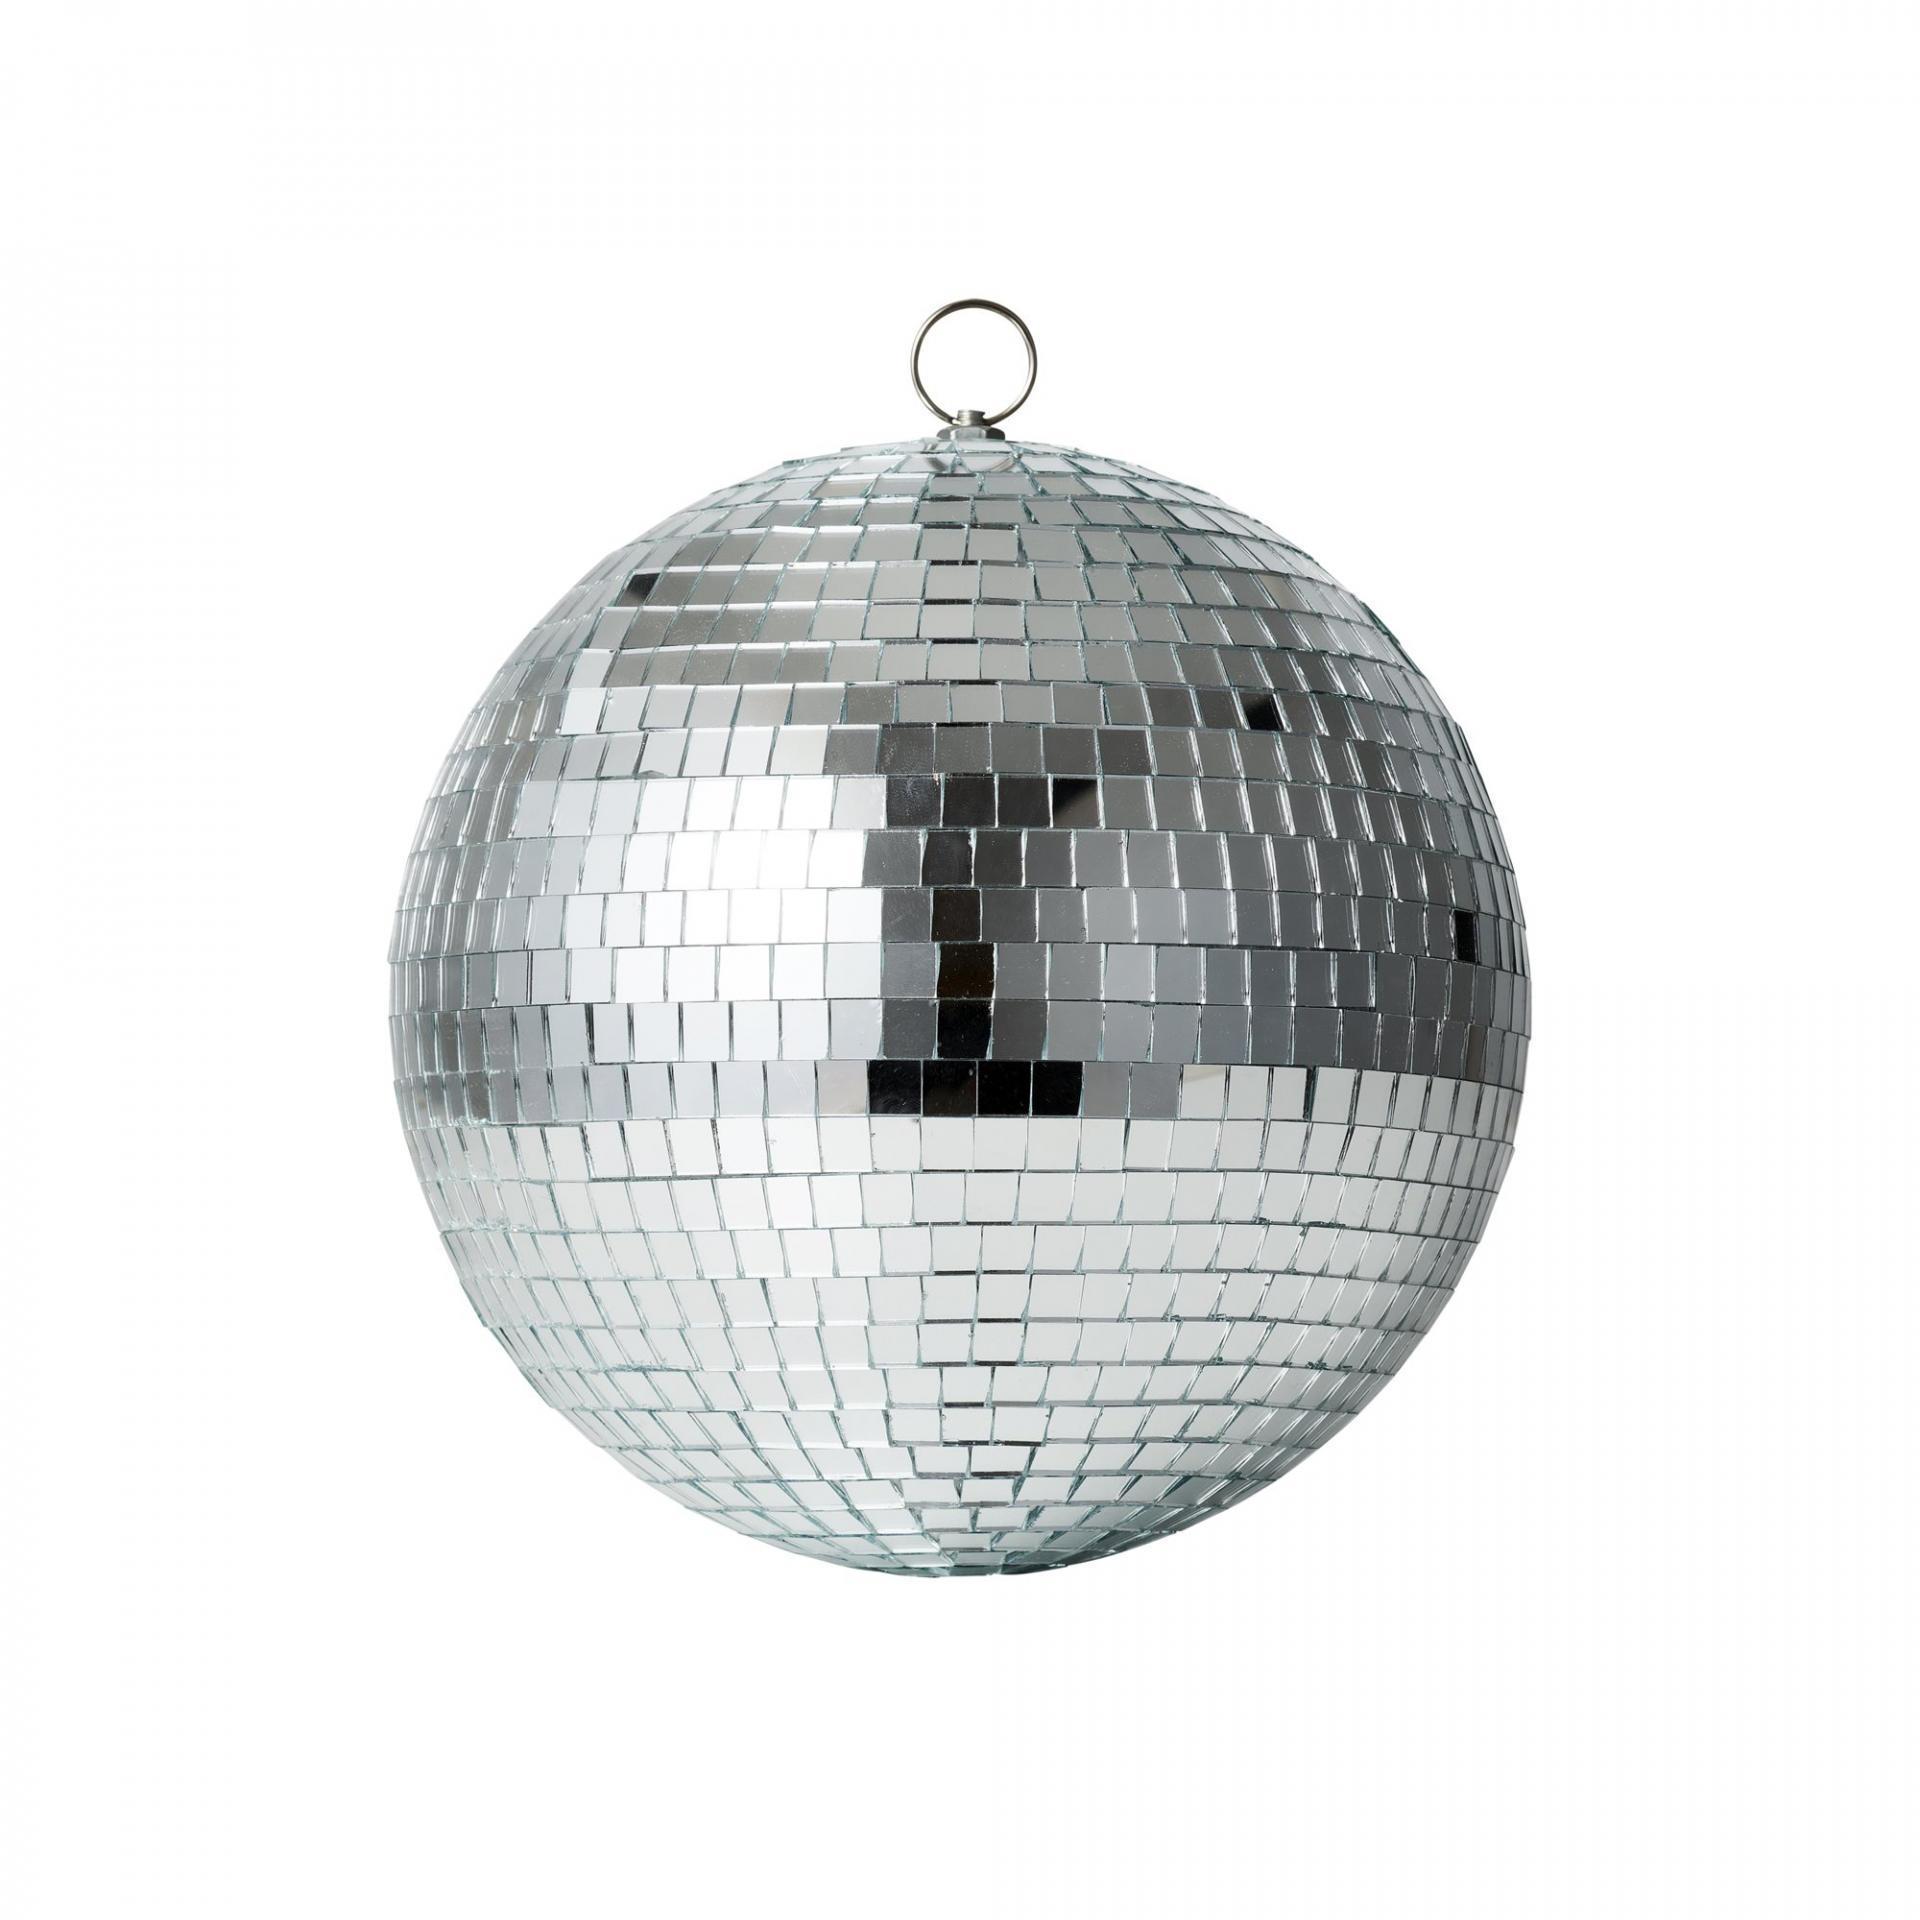 rice Závěsná dekorace Disco Ball, stříbrná barva, plast